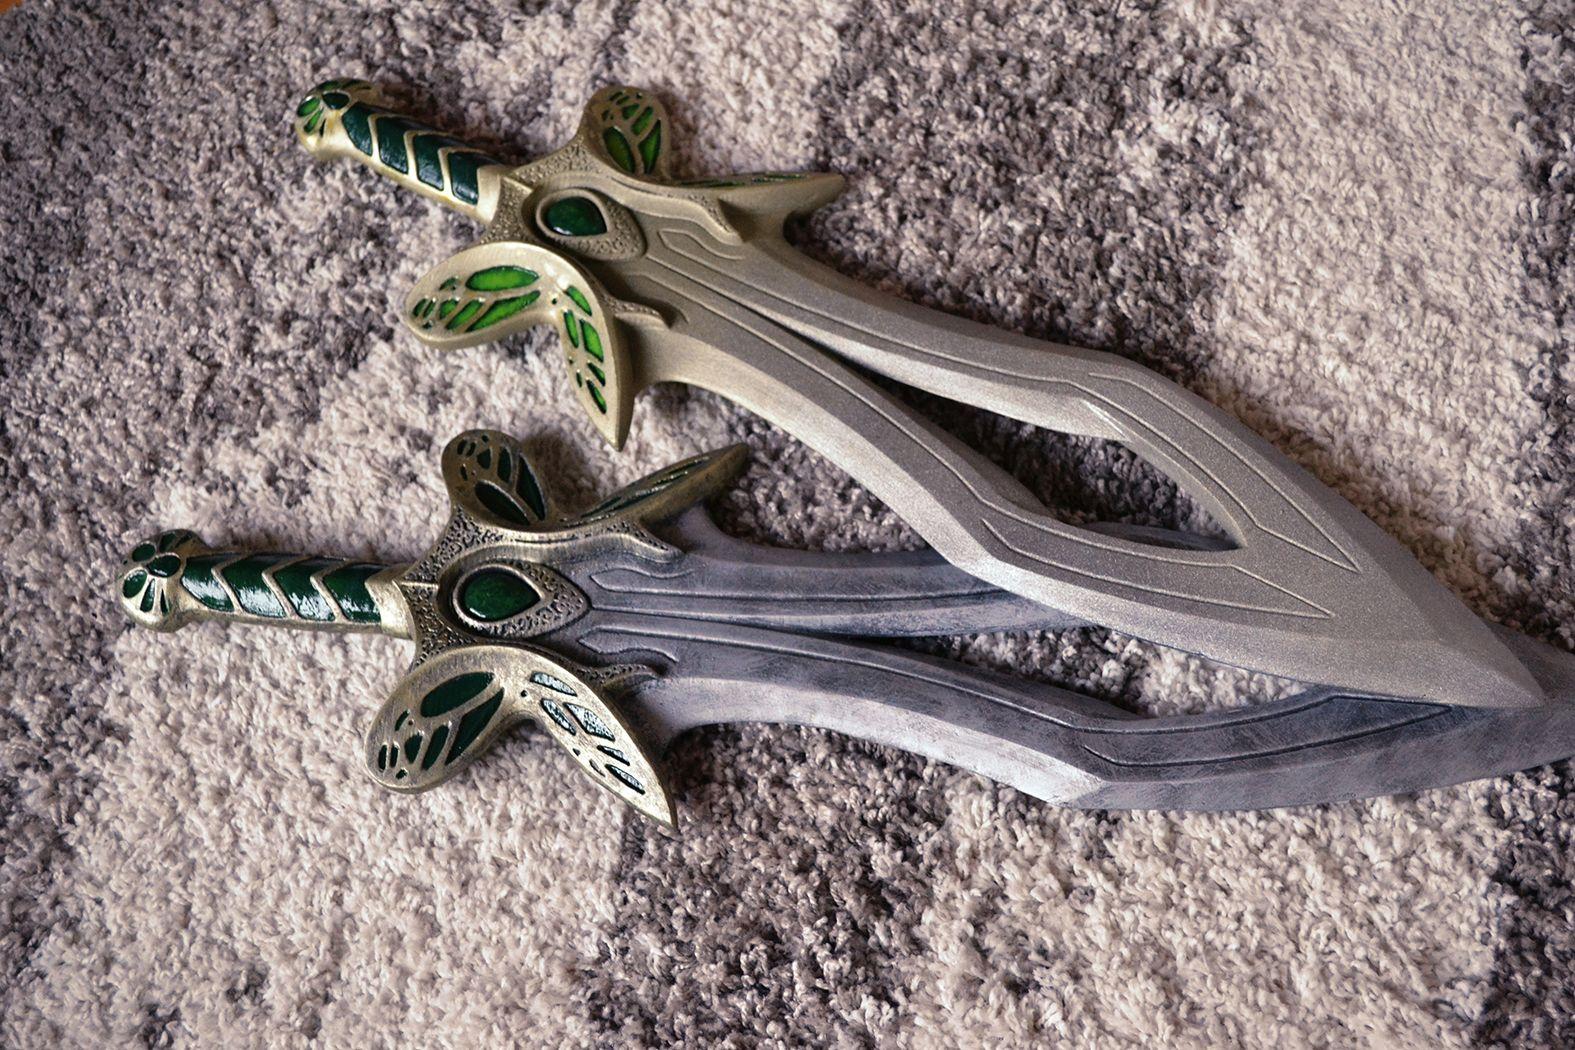 Dota 2 Butterfly Swords Handmade Replicas Real Life